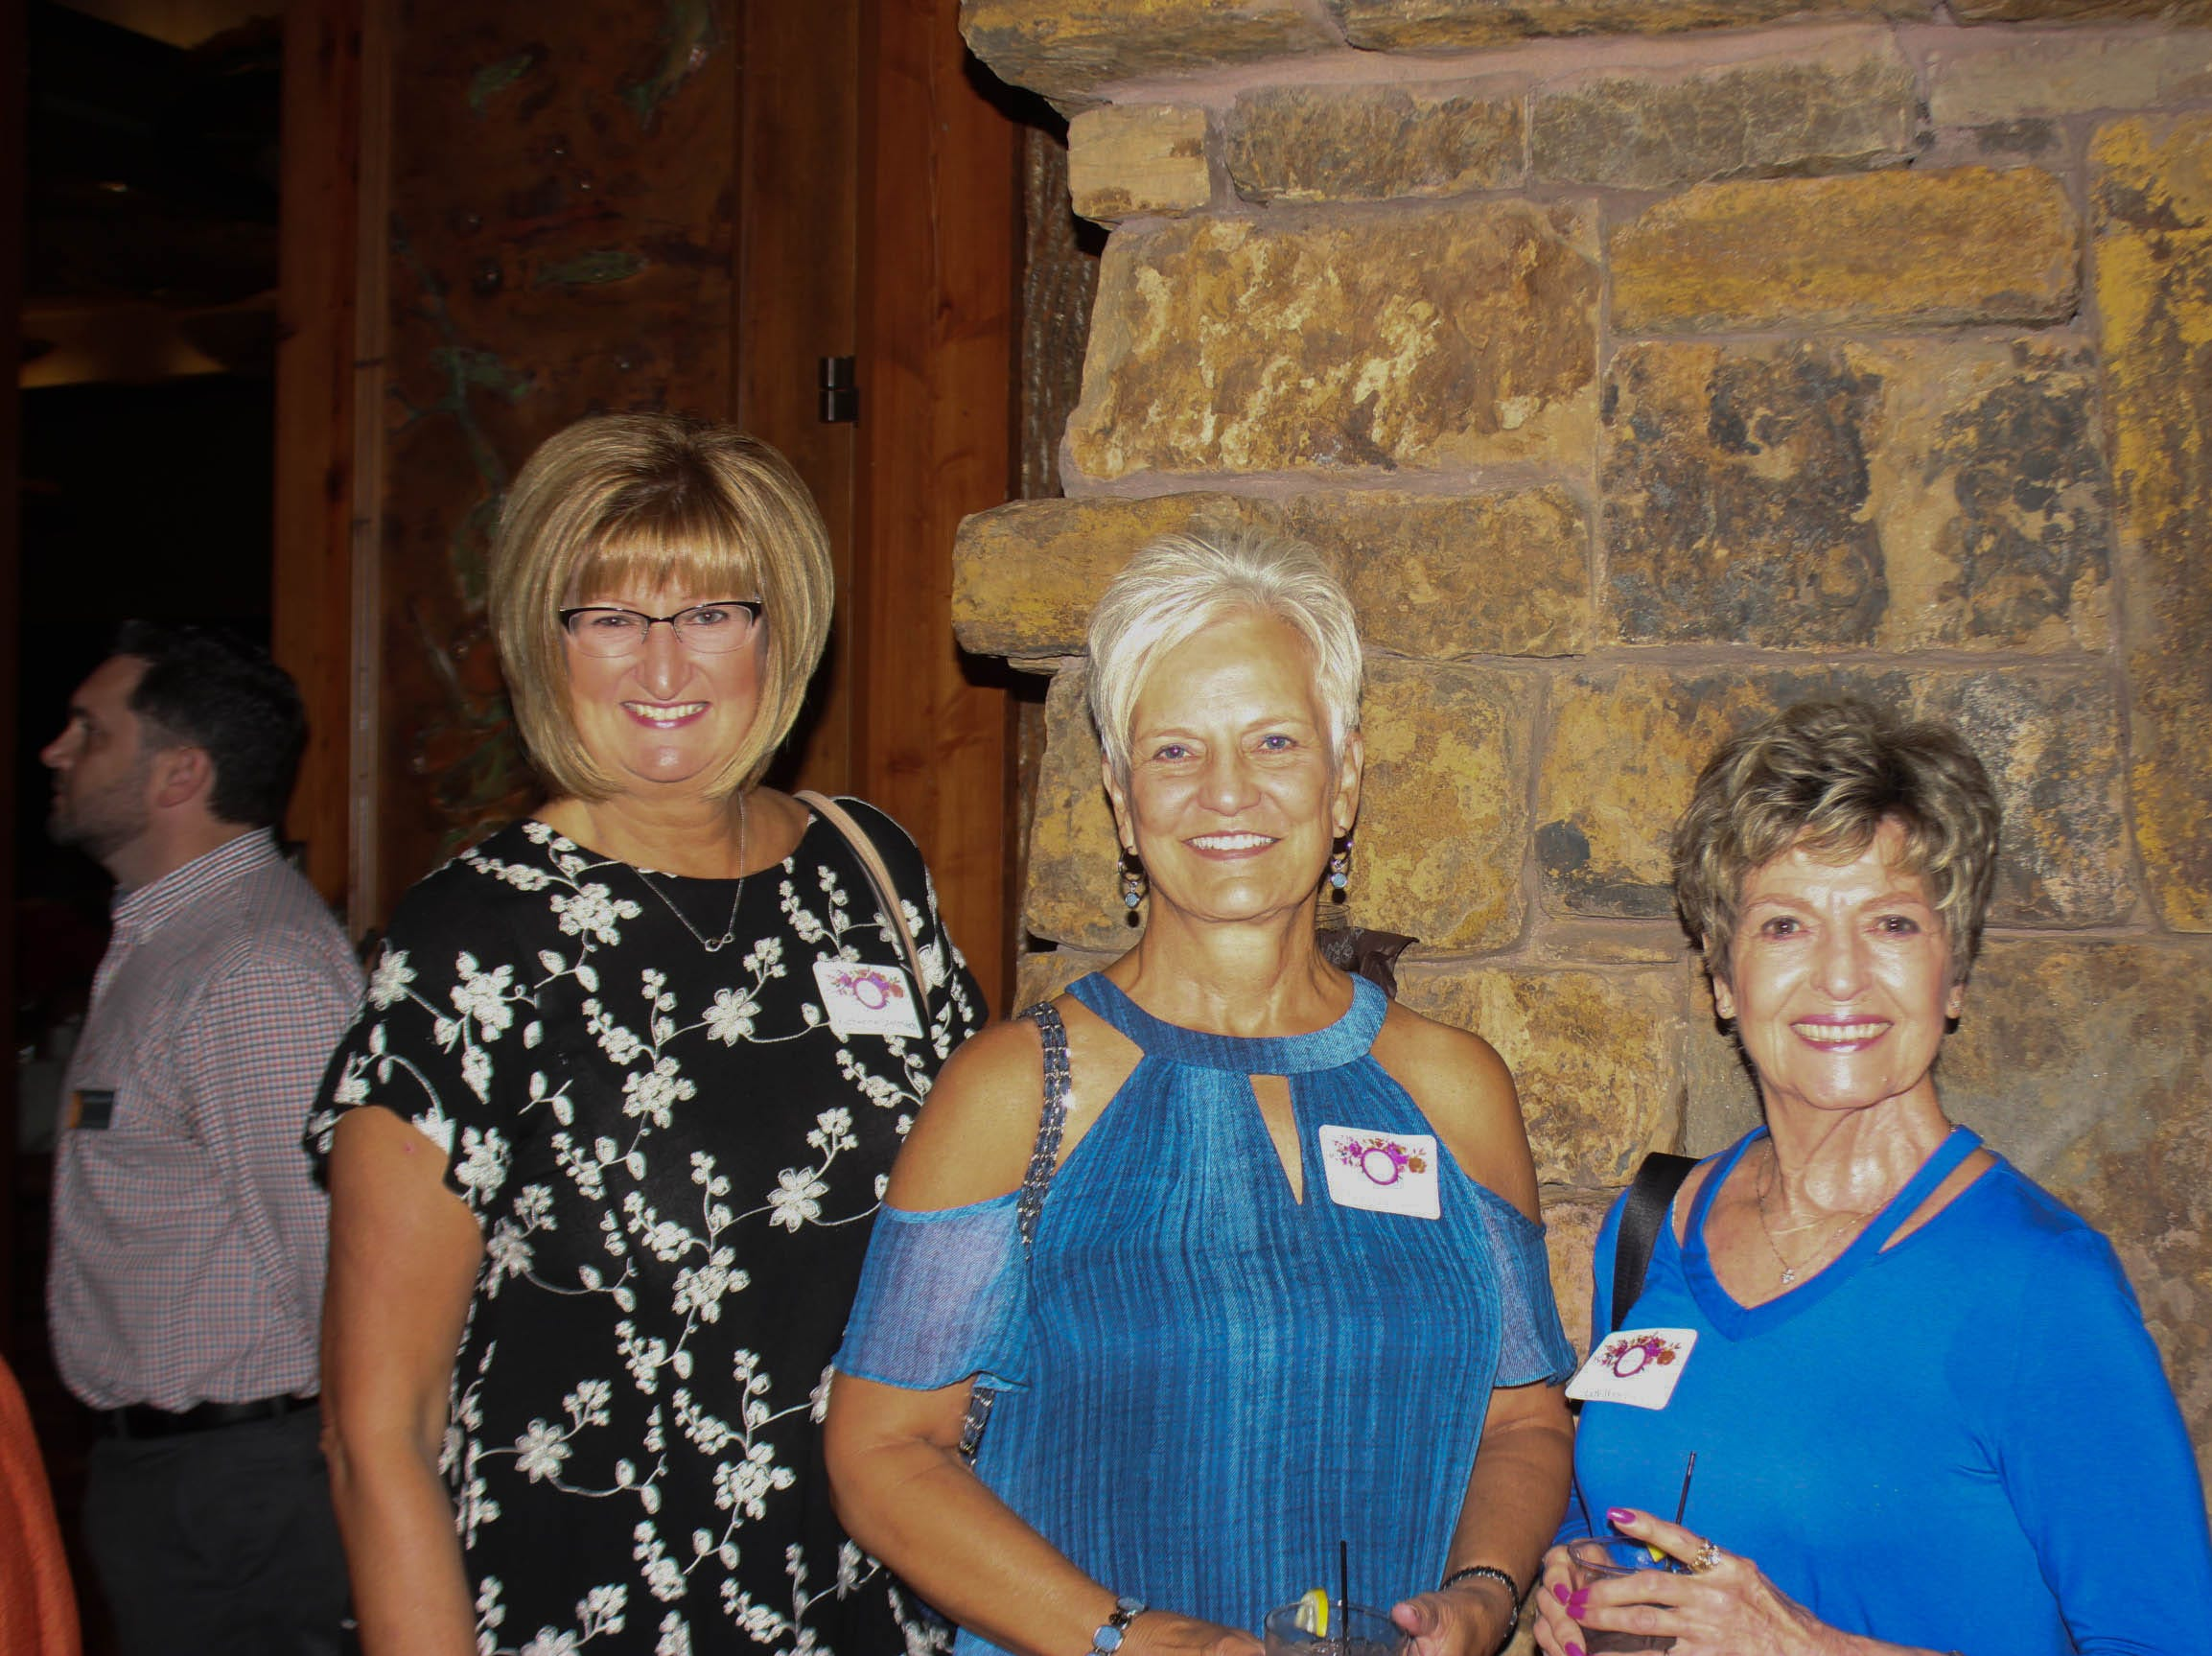 Kathy Stelmach, Donna Powers, and Judy Weekley